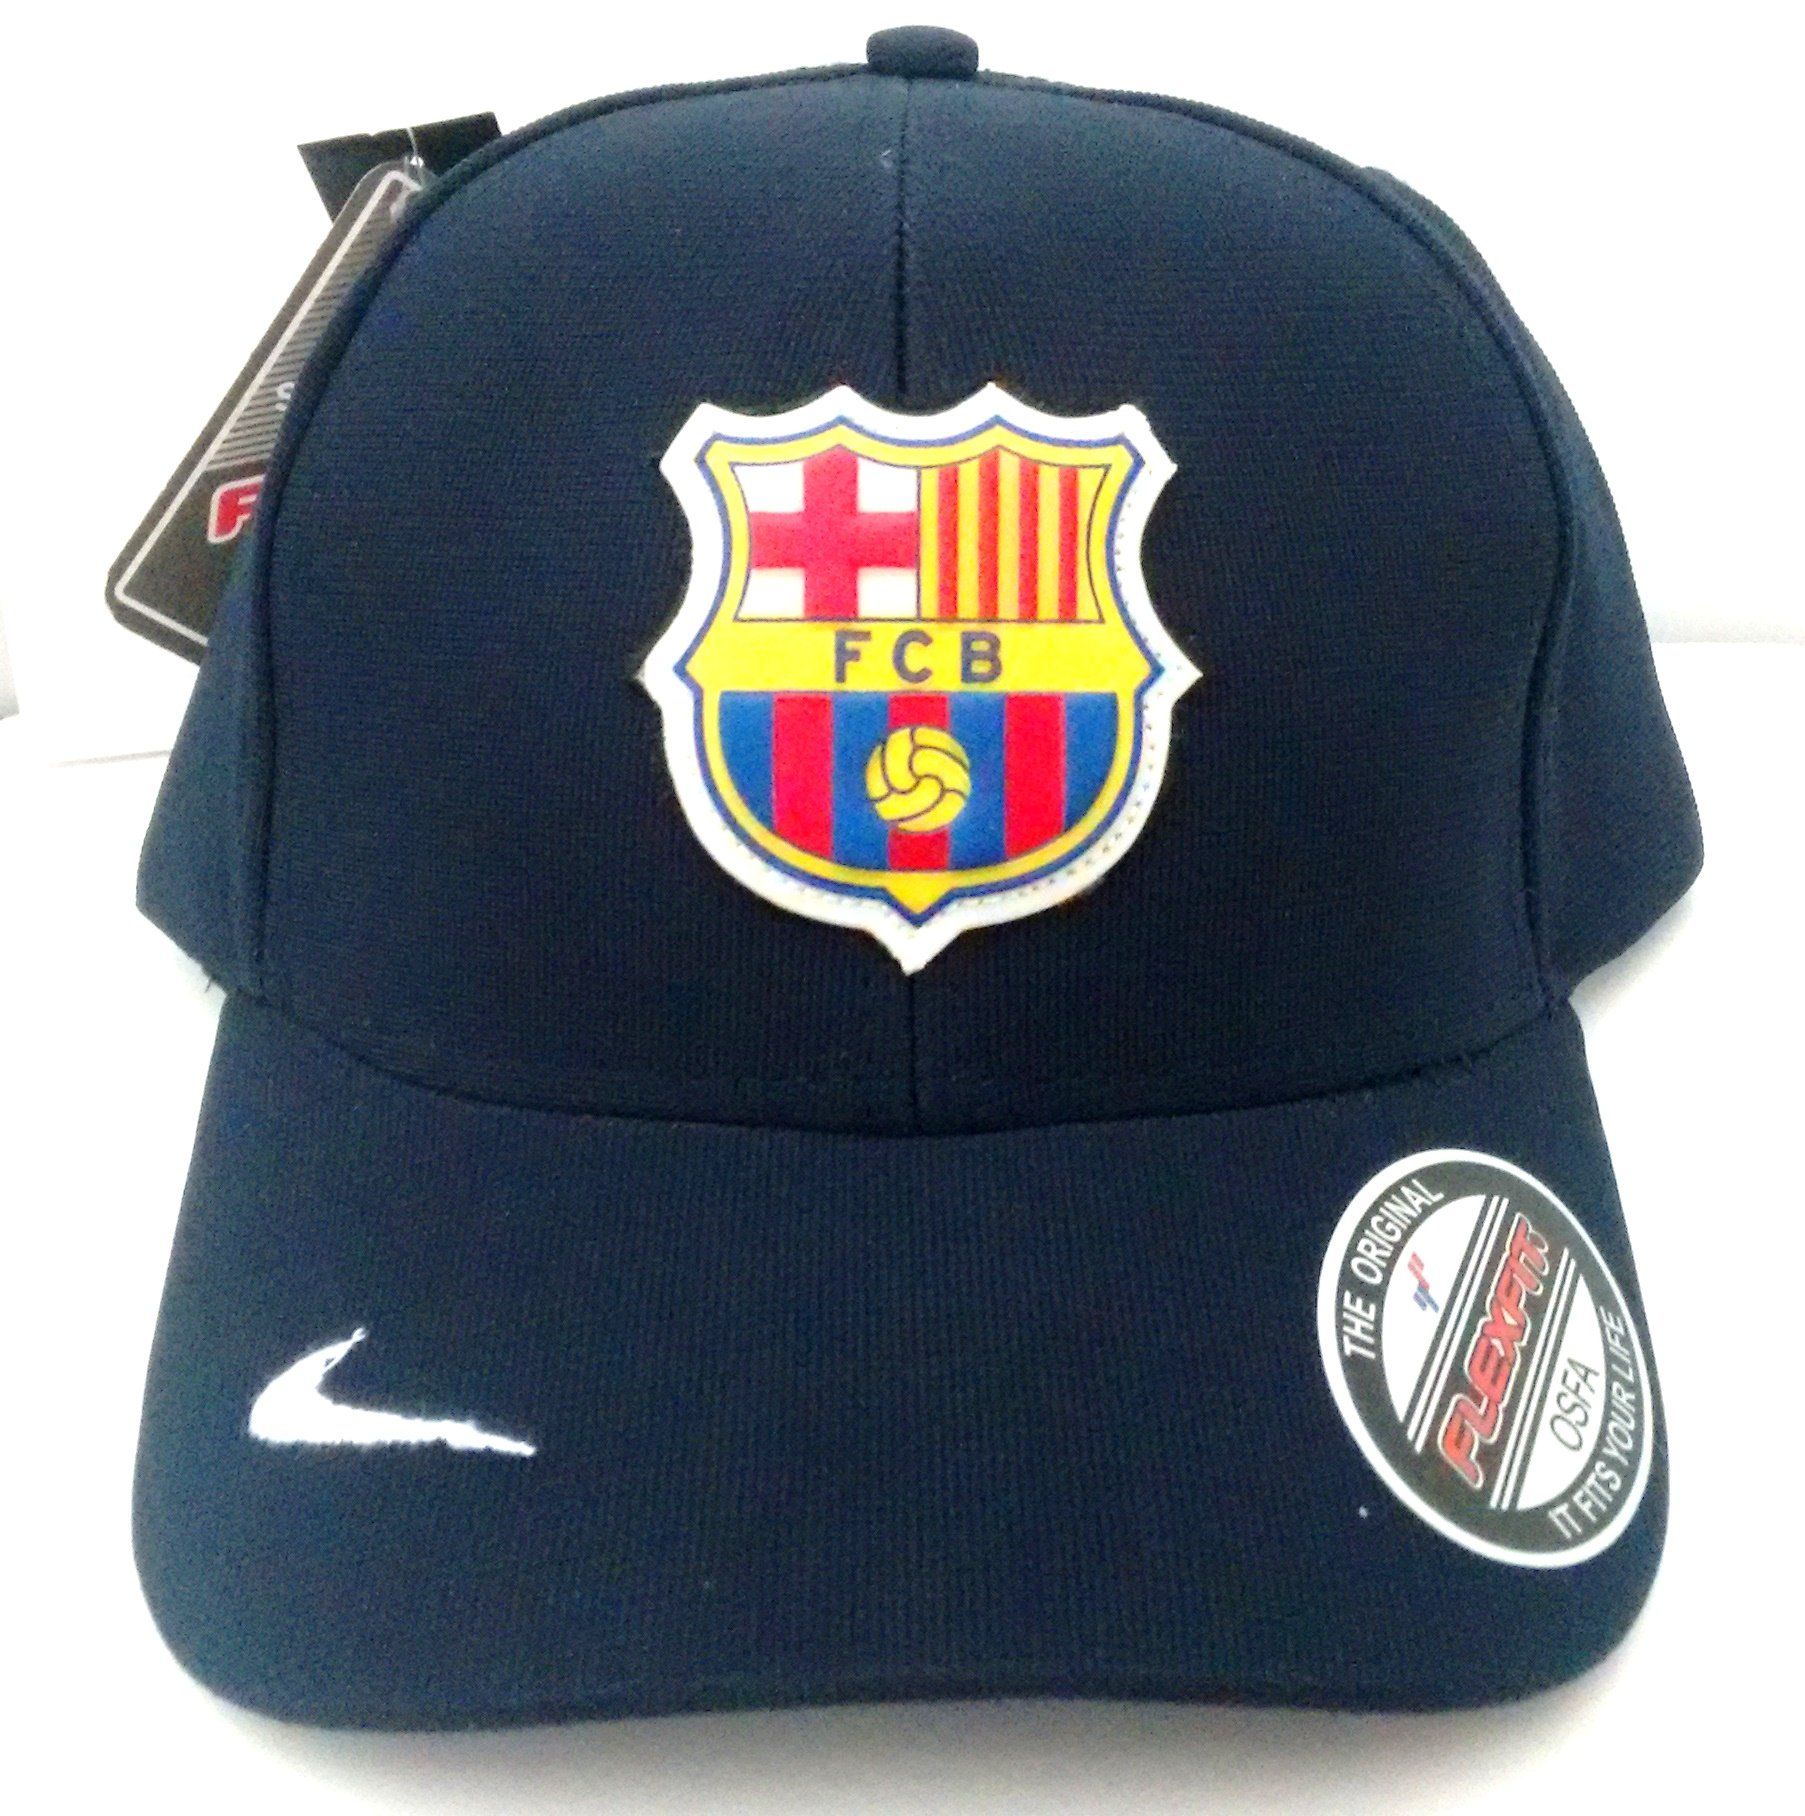 Boné do Barcelona aba curva - Camarote do Torcedor a0921ec1fa6